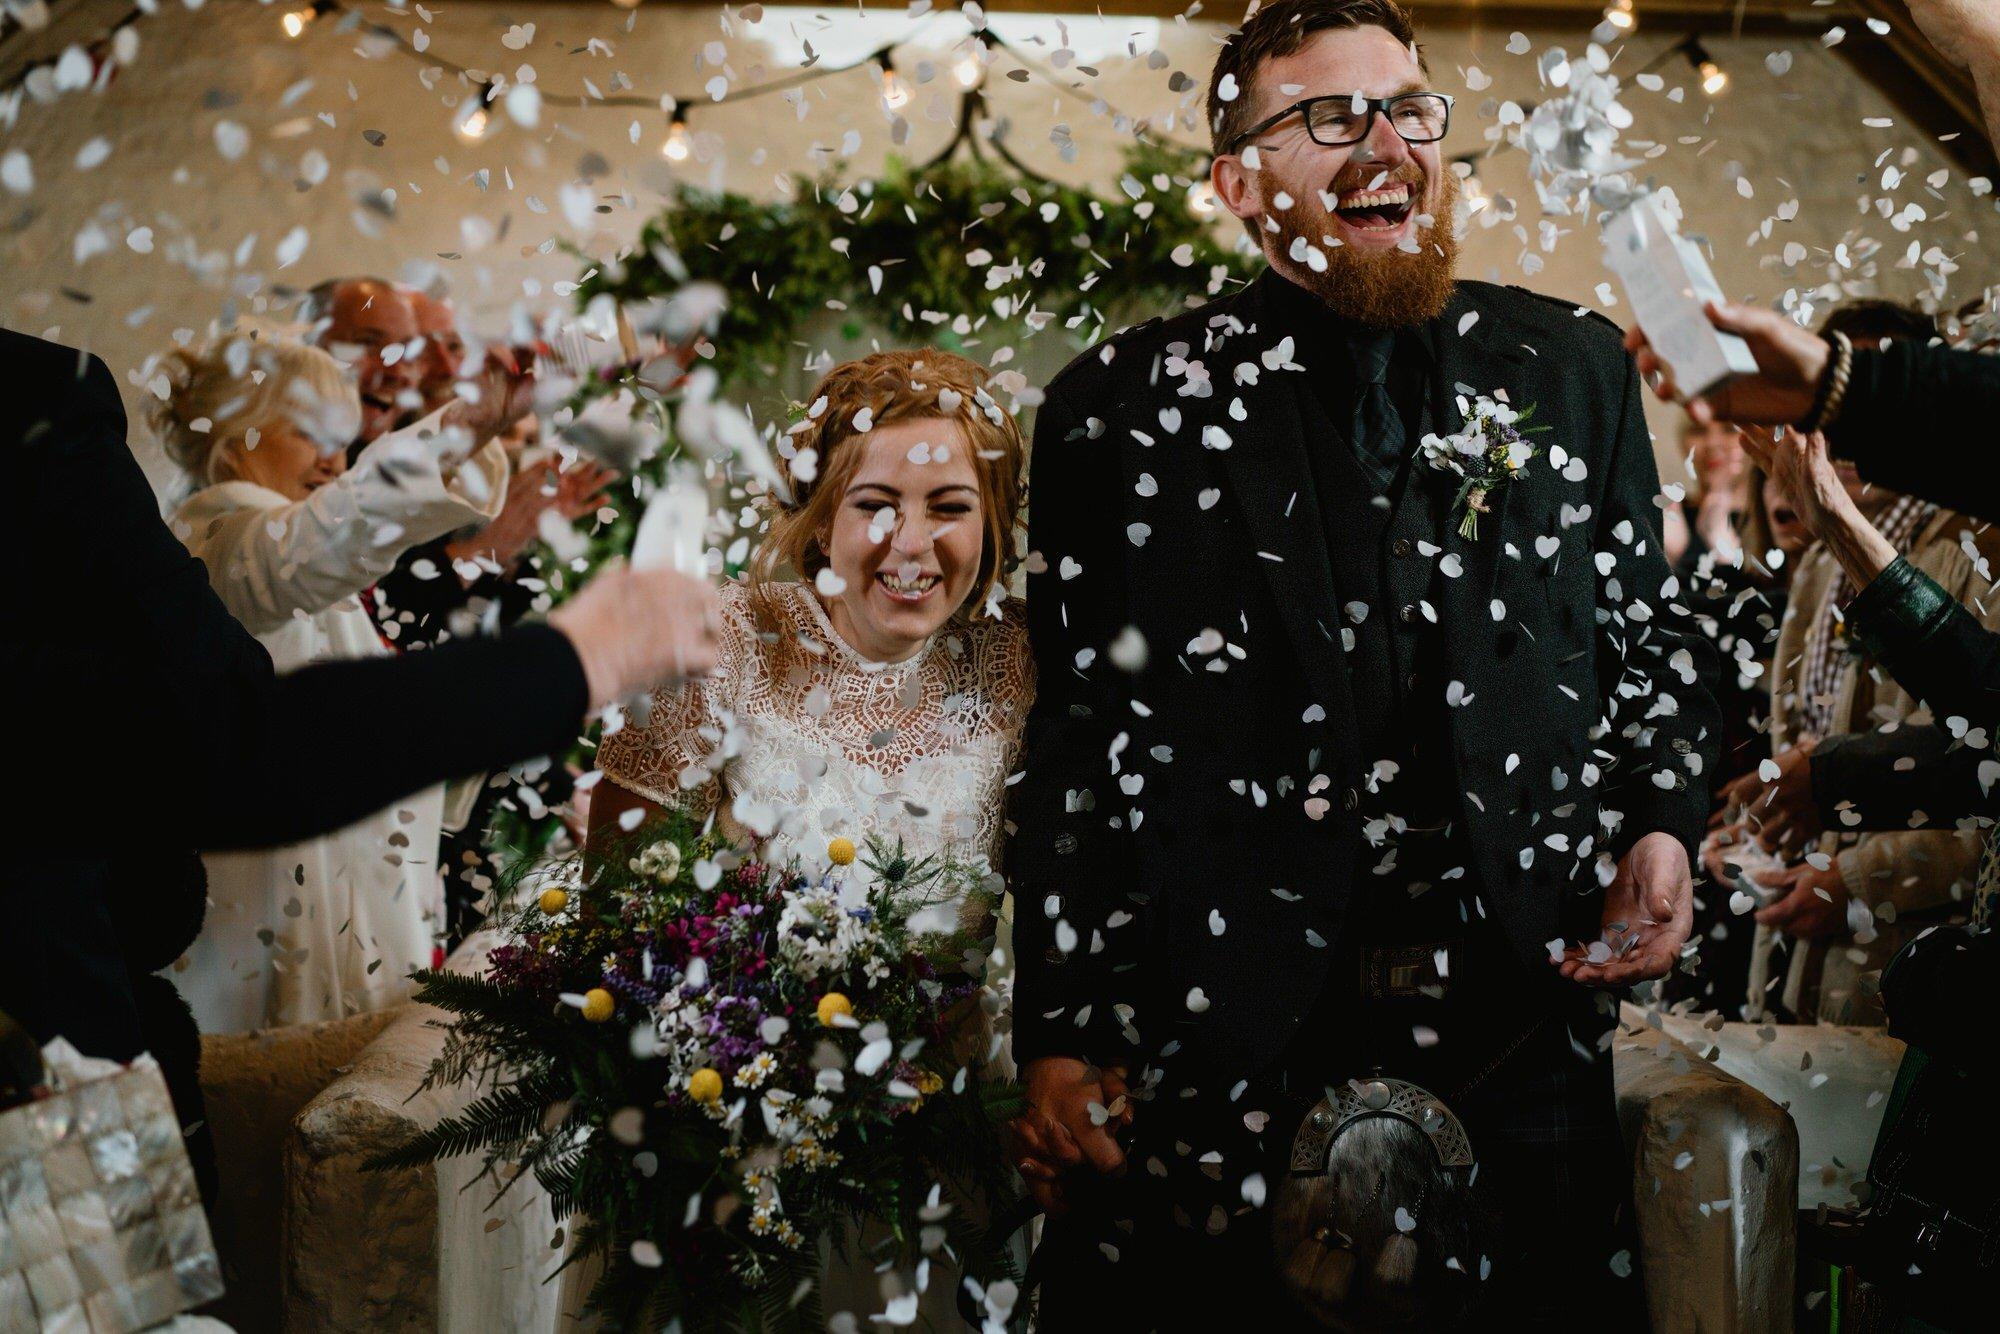 029 STONE BOTHY CEREMONY TIN SHED KNOCKRAICH WEDDING AUSTRIAN SCOTTISH COUPLE CONFETTI ZOE ALEXANDRA PHOTOGRAPHY